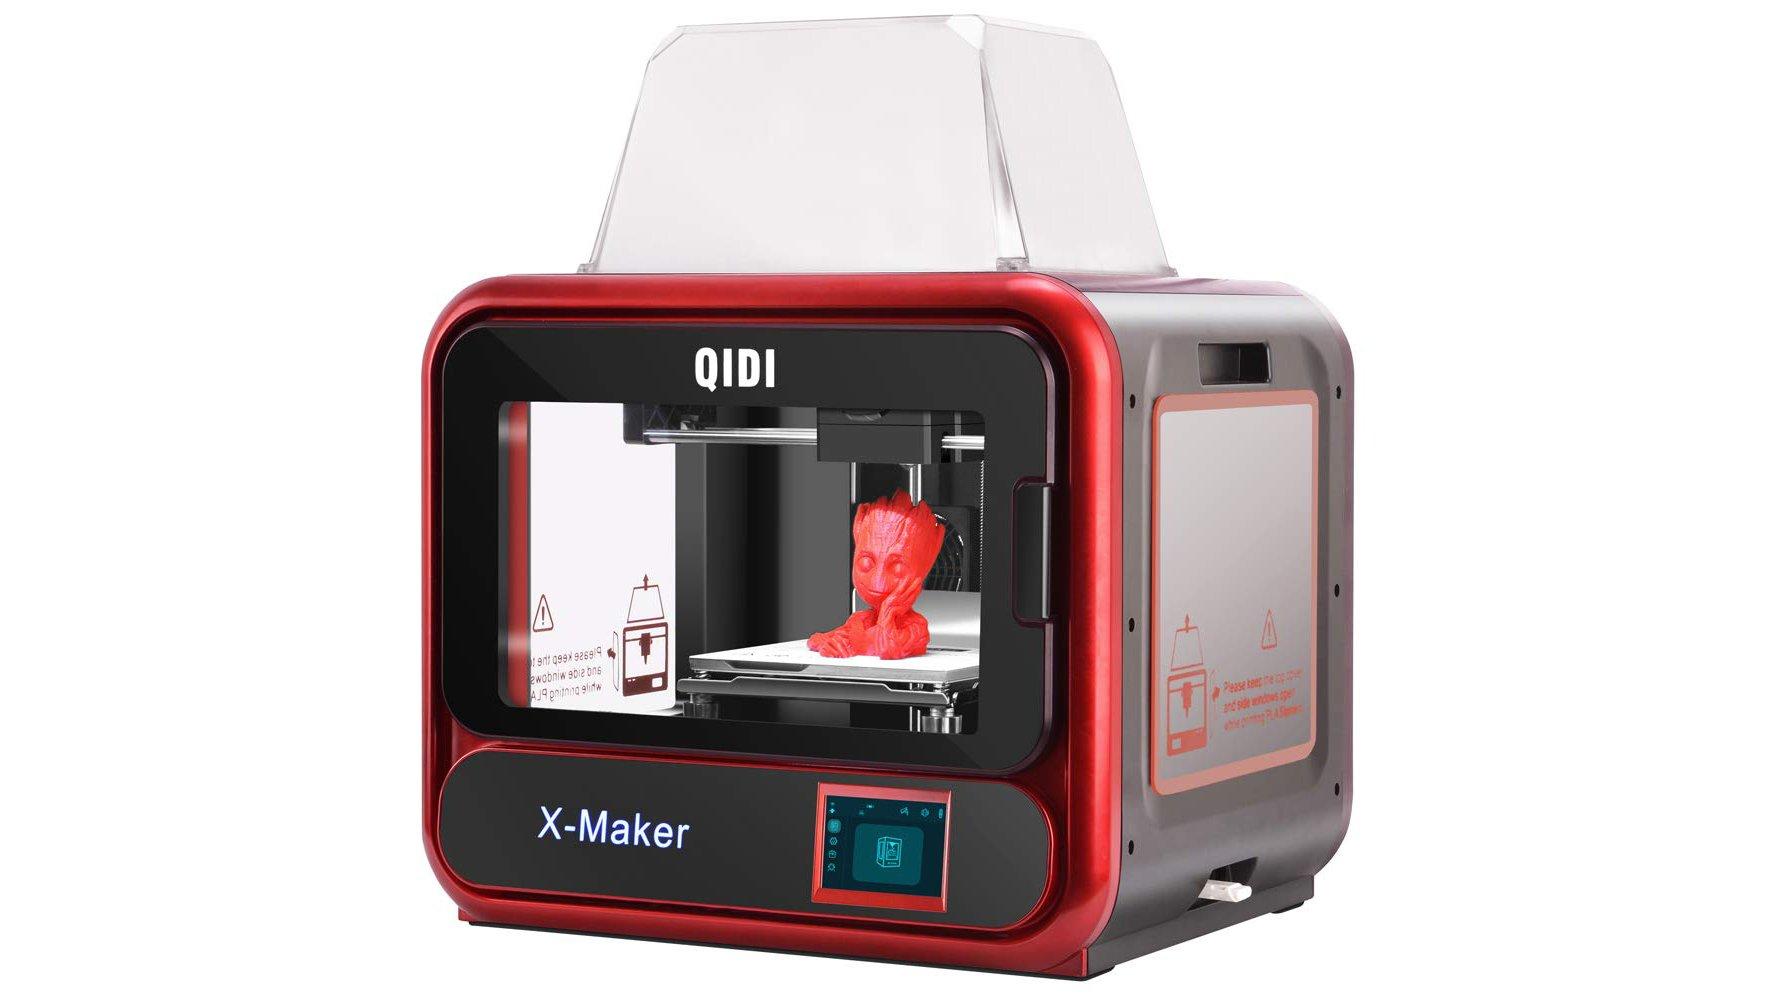 Qidi Tech X-Maker: Review the Specs | All3DP